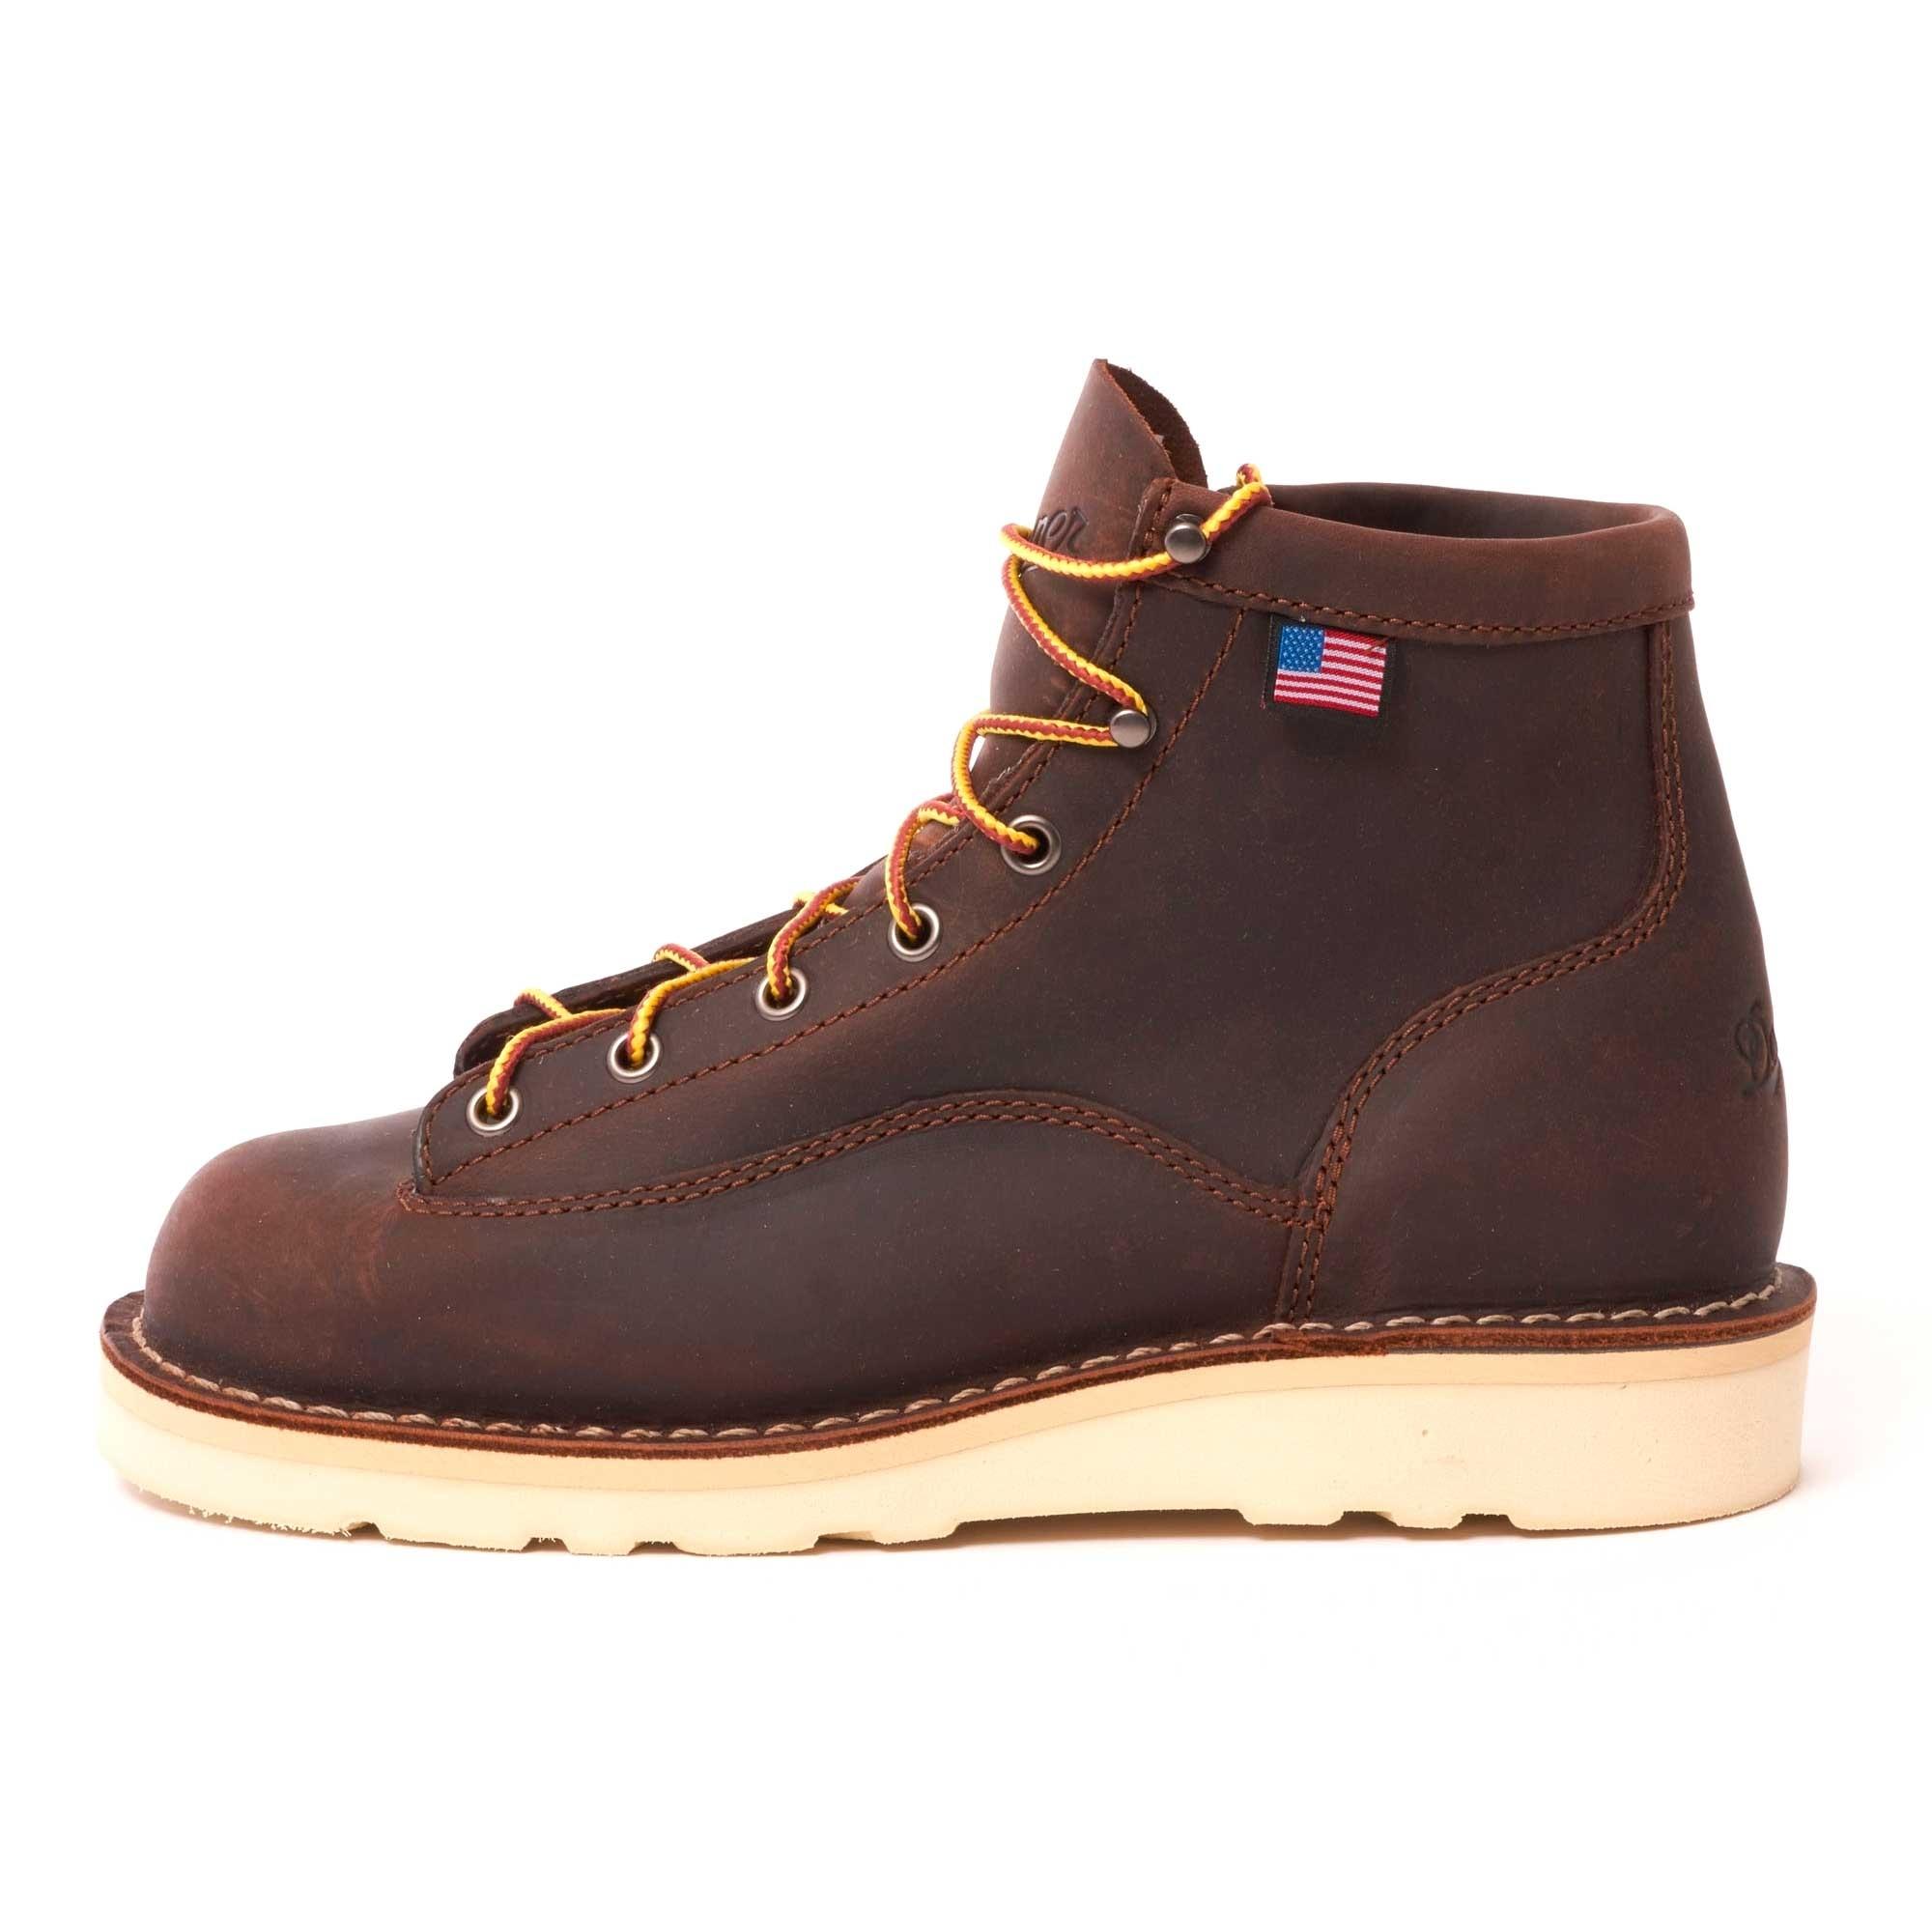 danner boots 6